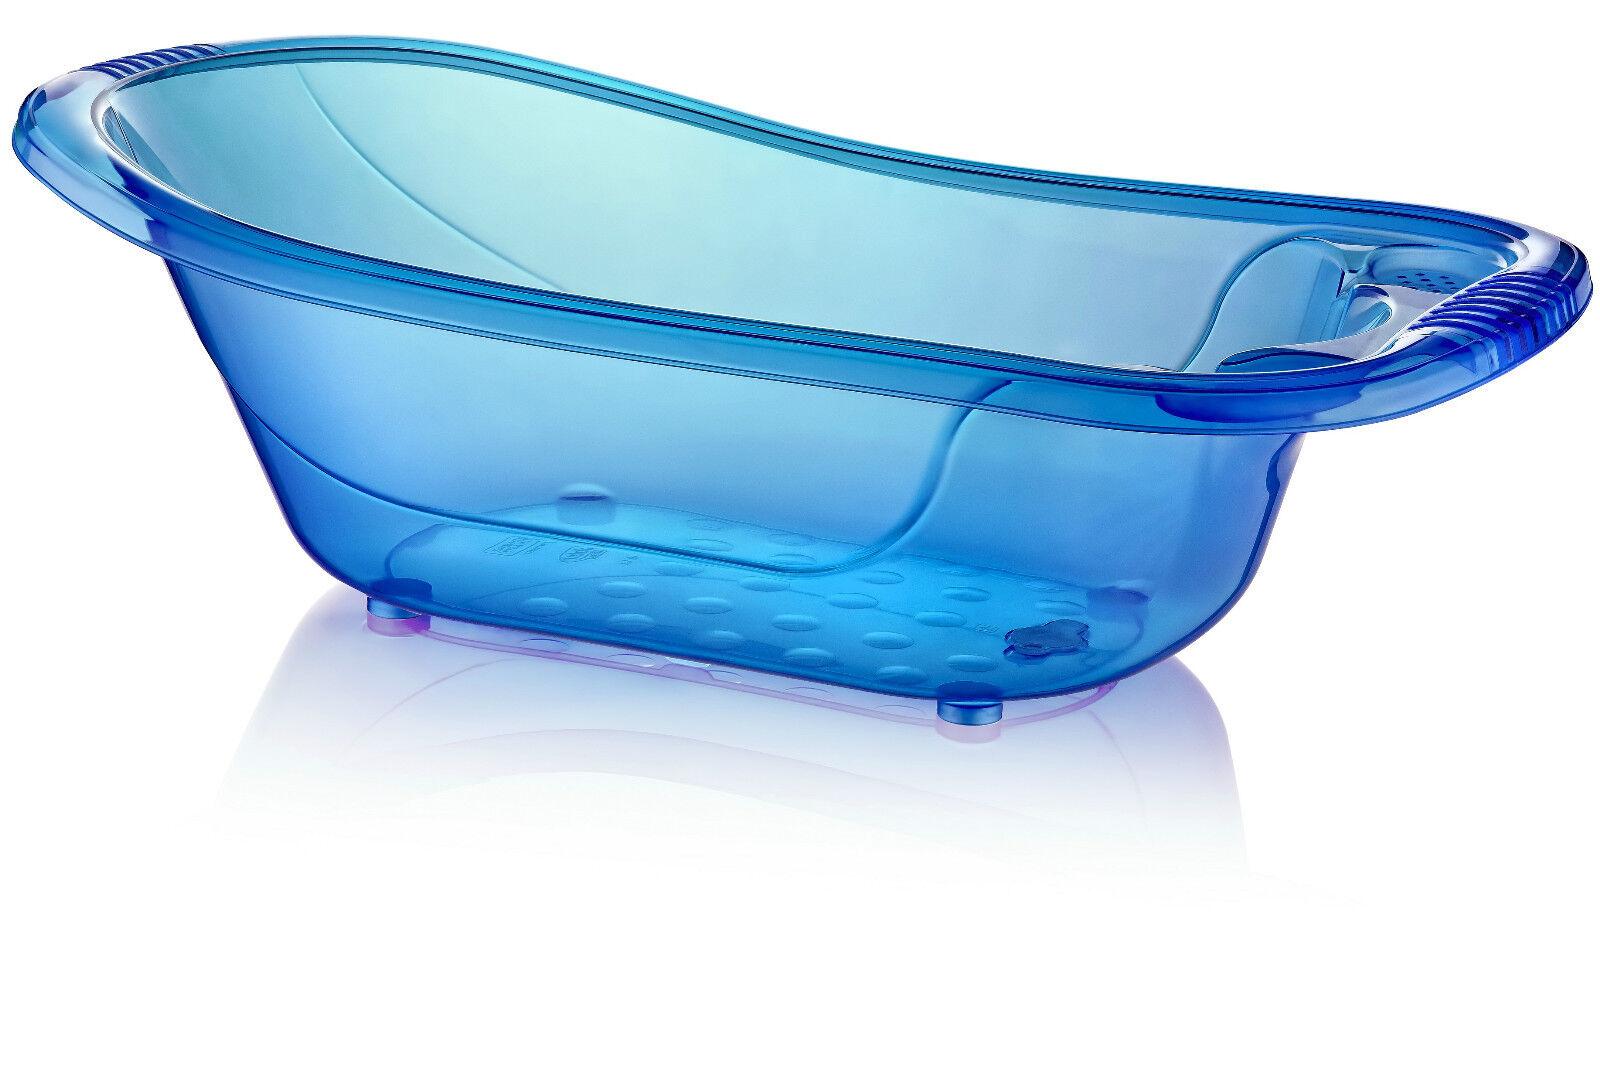 Large 50 Litre Aqua Blue Clear Transparent Baby Bath Tub   eBay